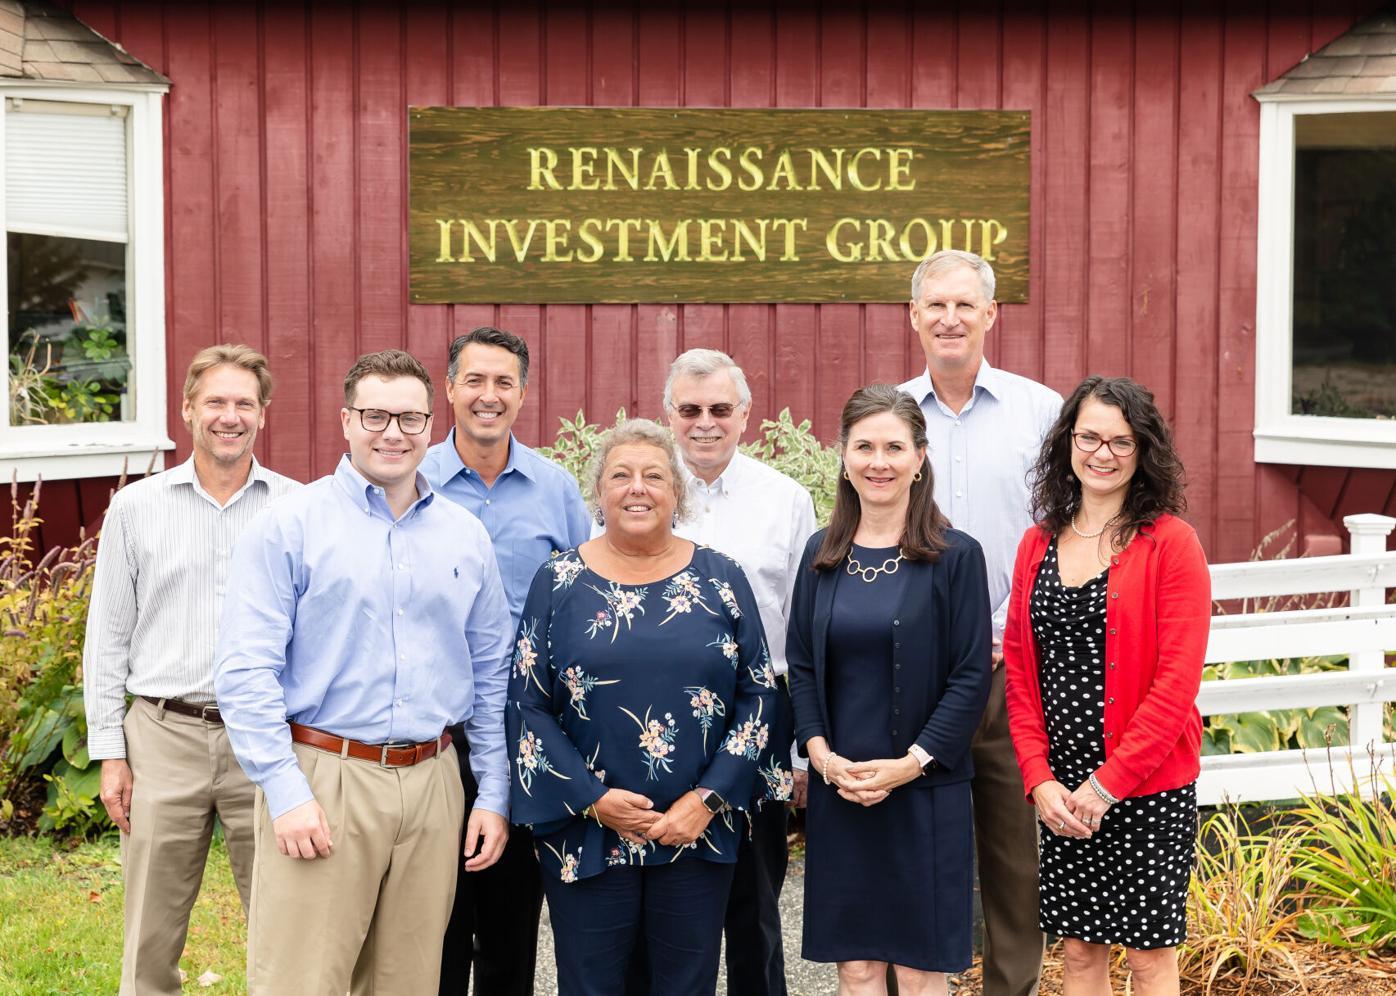 Rennaissance Investment Group